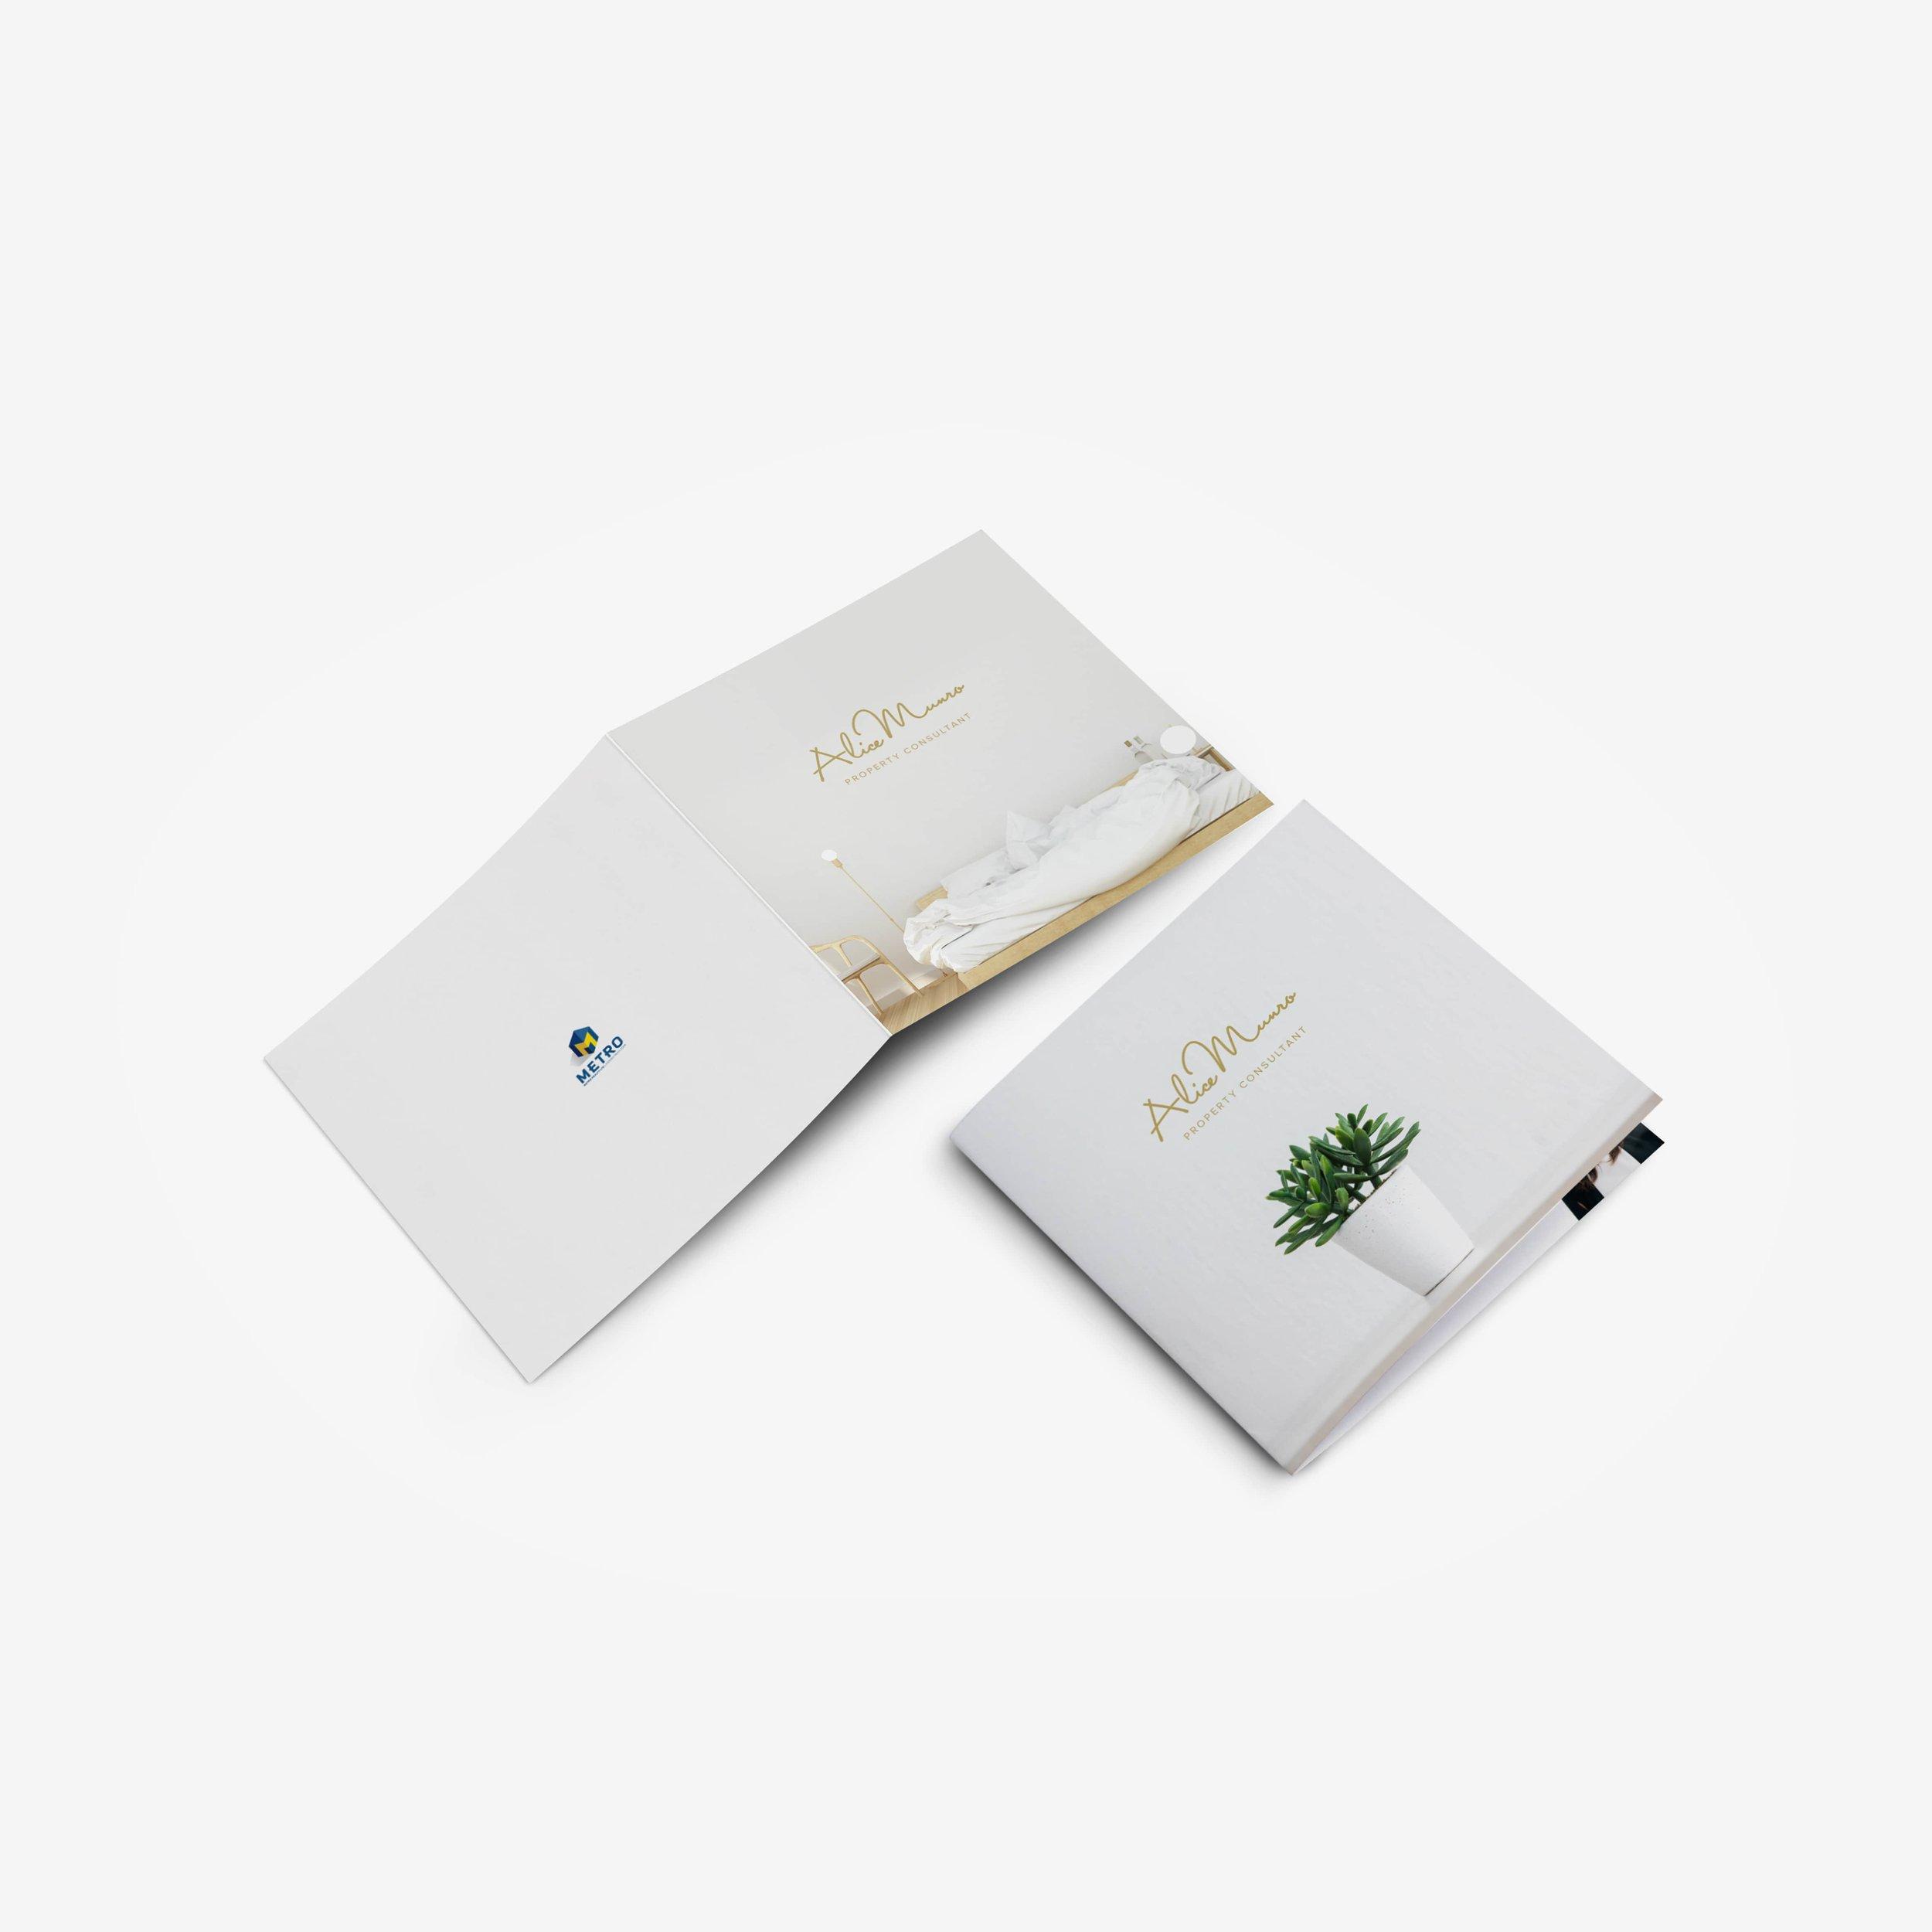 Alice Munro - Greeting Card 1 (square)-min.jpg